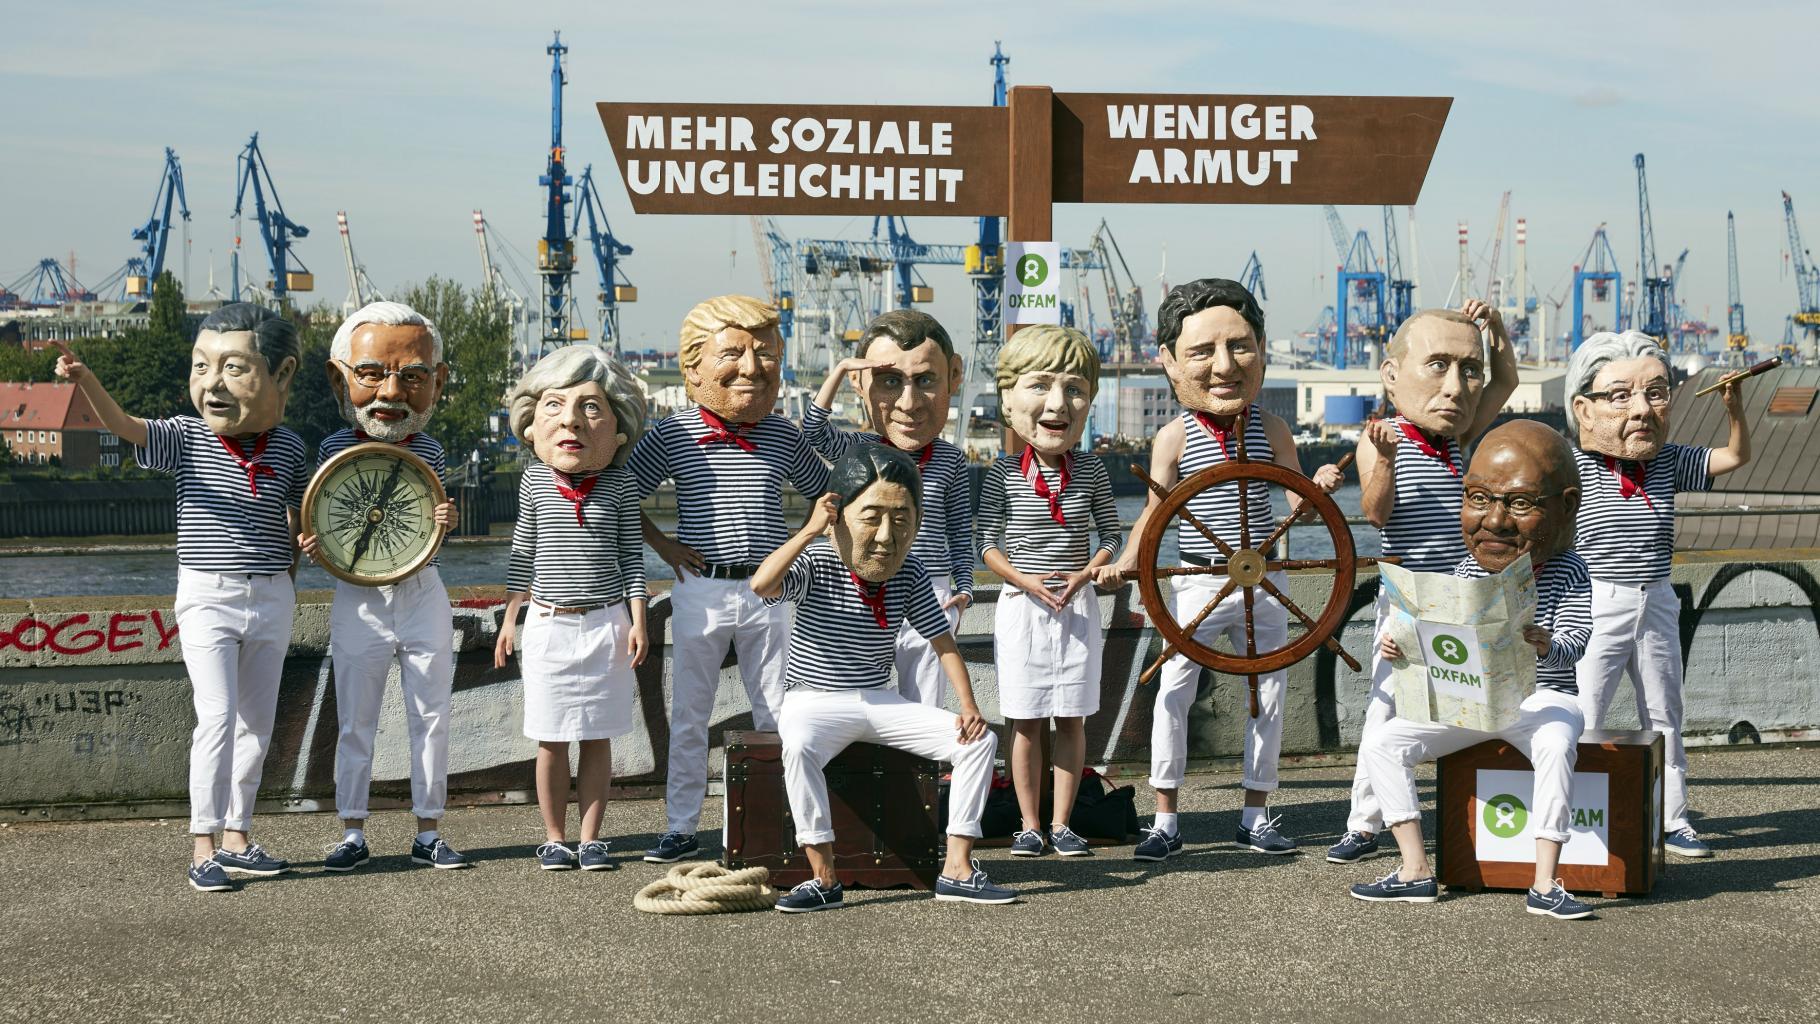 G20 Oxfam Photostunt